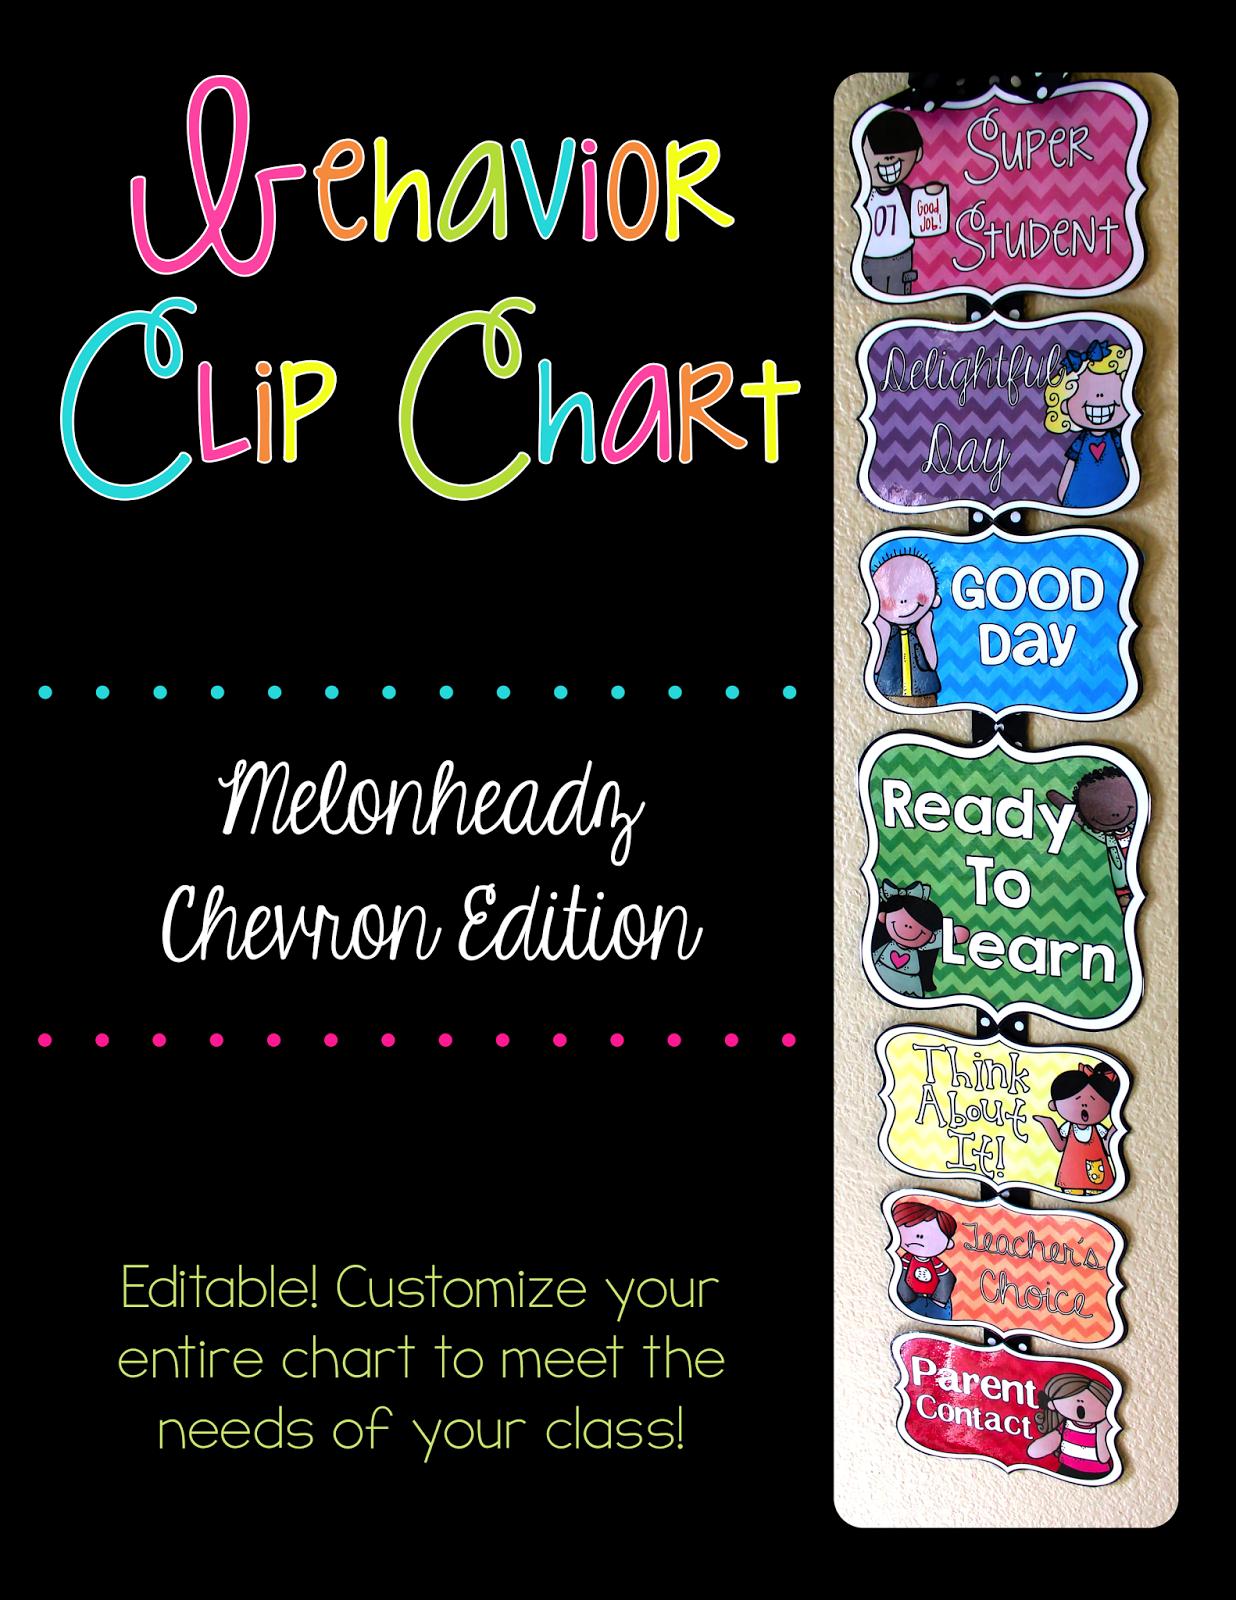 http://www.teacherspayteachers.com/Product/Editable-Behavior-Chart-Melonheadz-Chevron-Edition-1336807